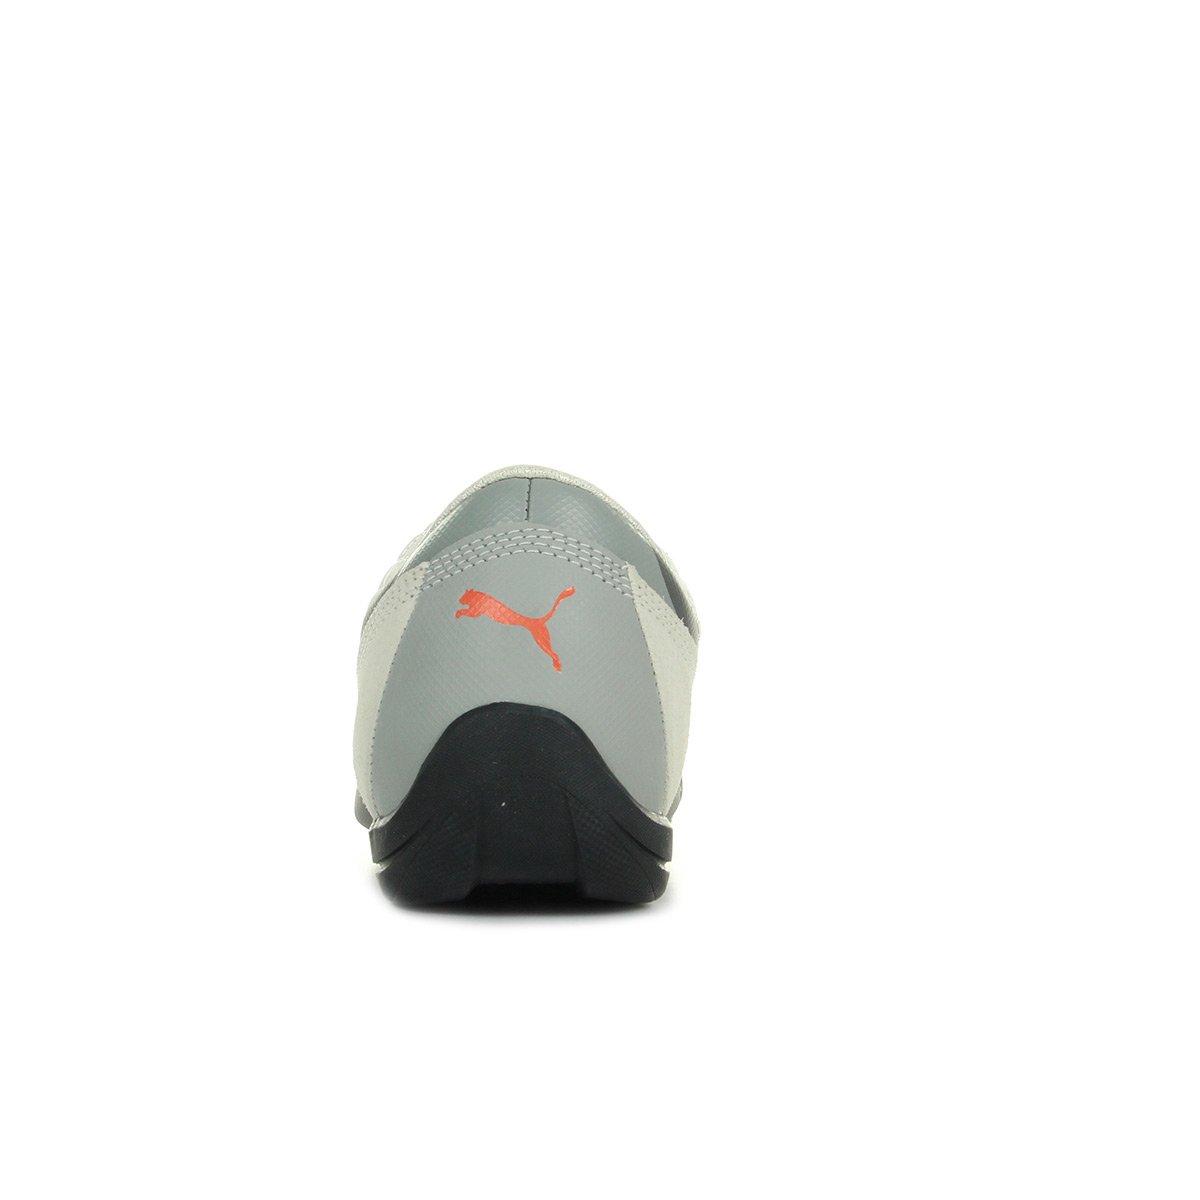 Puma Drift Cat 6 Suede 30510101, Basket